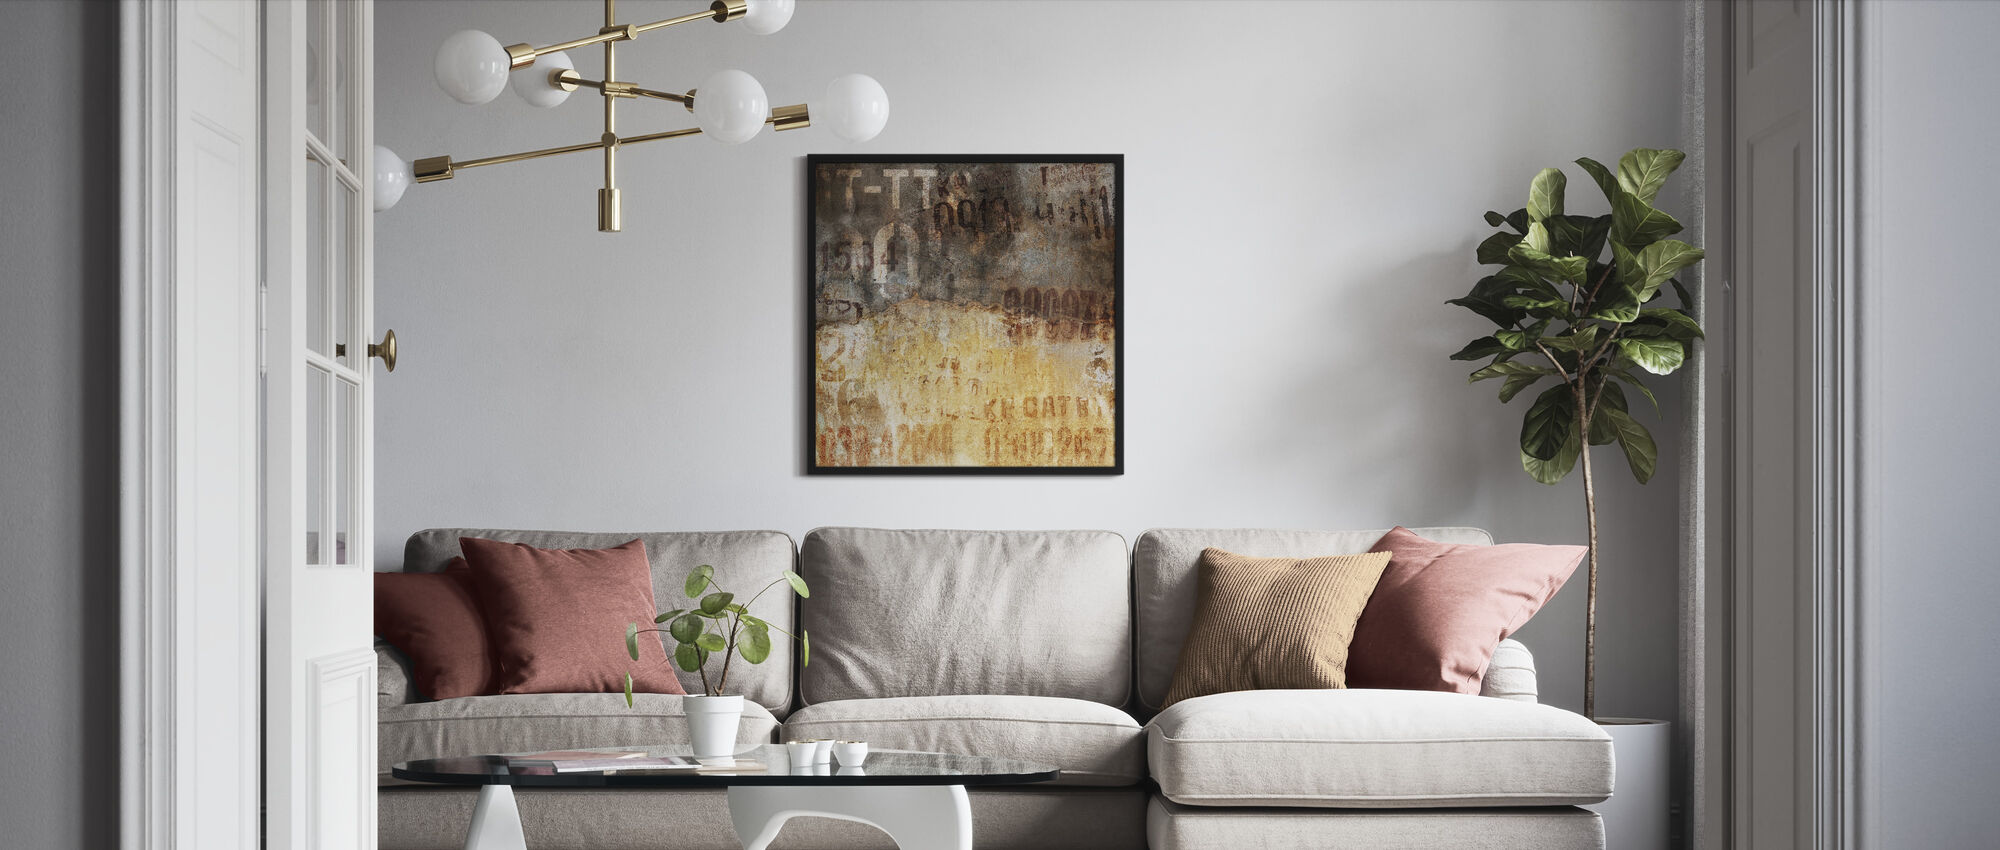 Old Grunge Wall - Framed print - Living Room